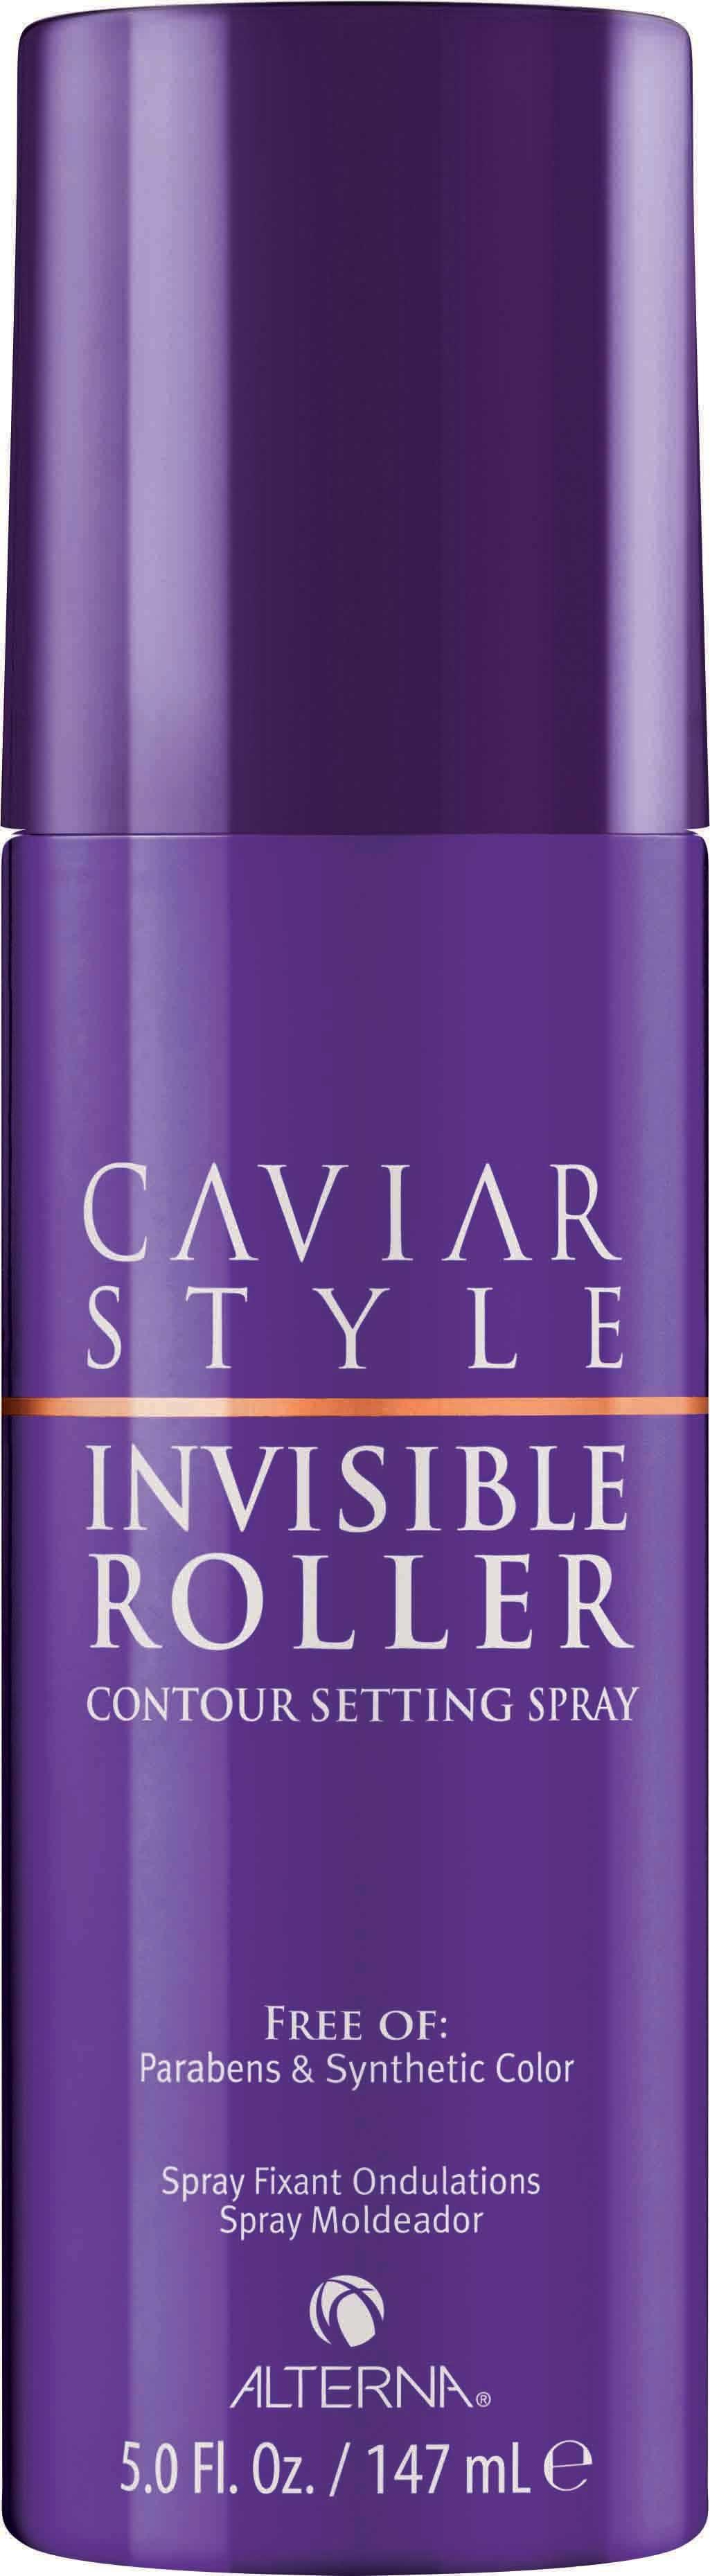 Alterna Caviar Style Invisible Roller Contour Setting ...